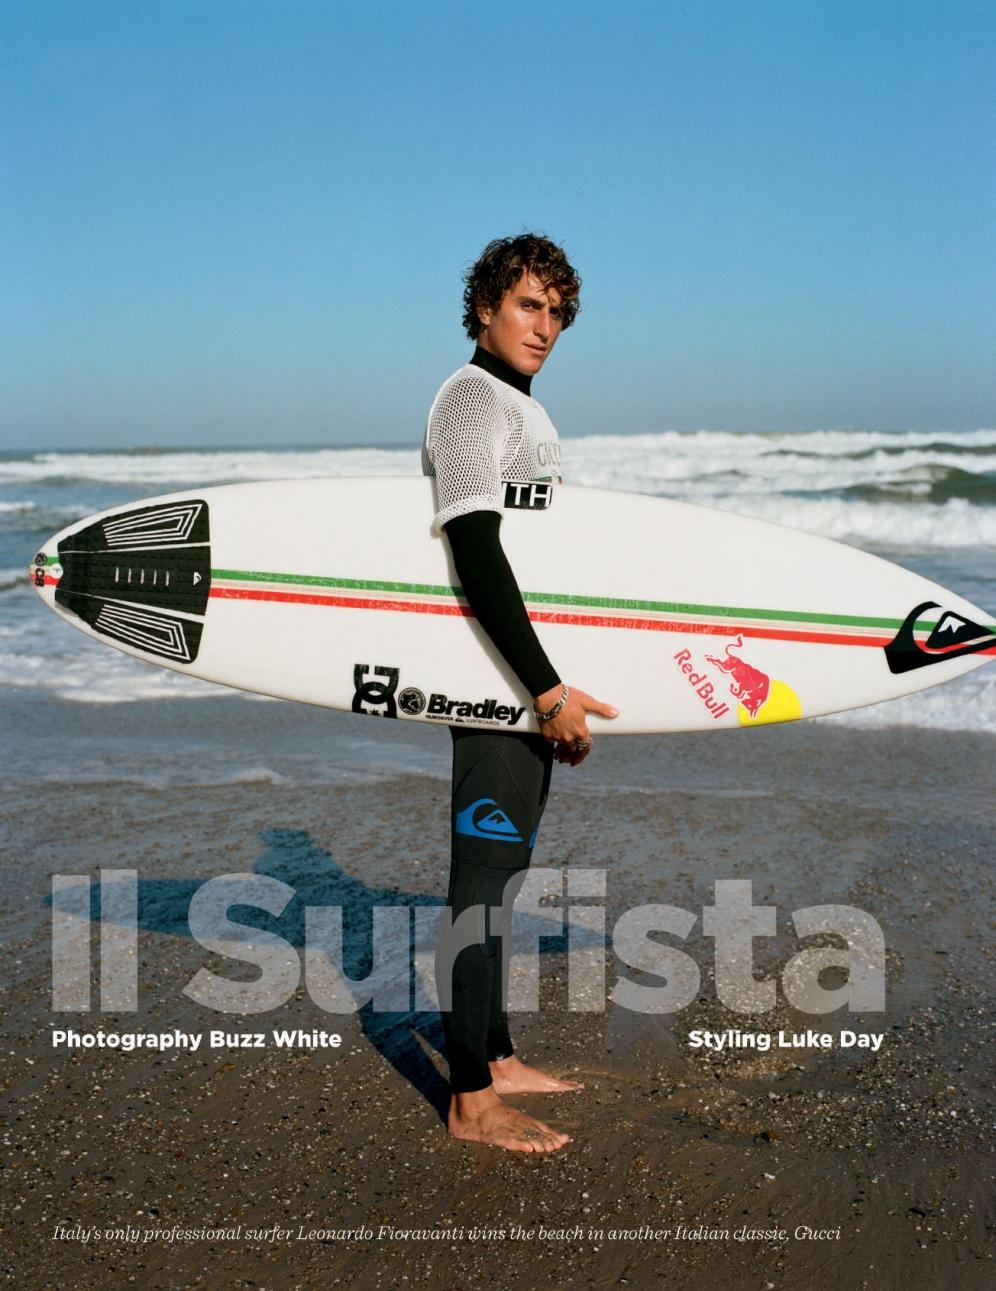 GQ Style | Il Surfista